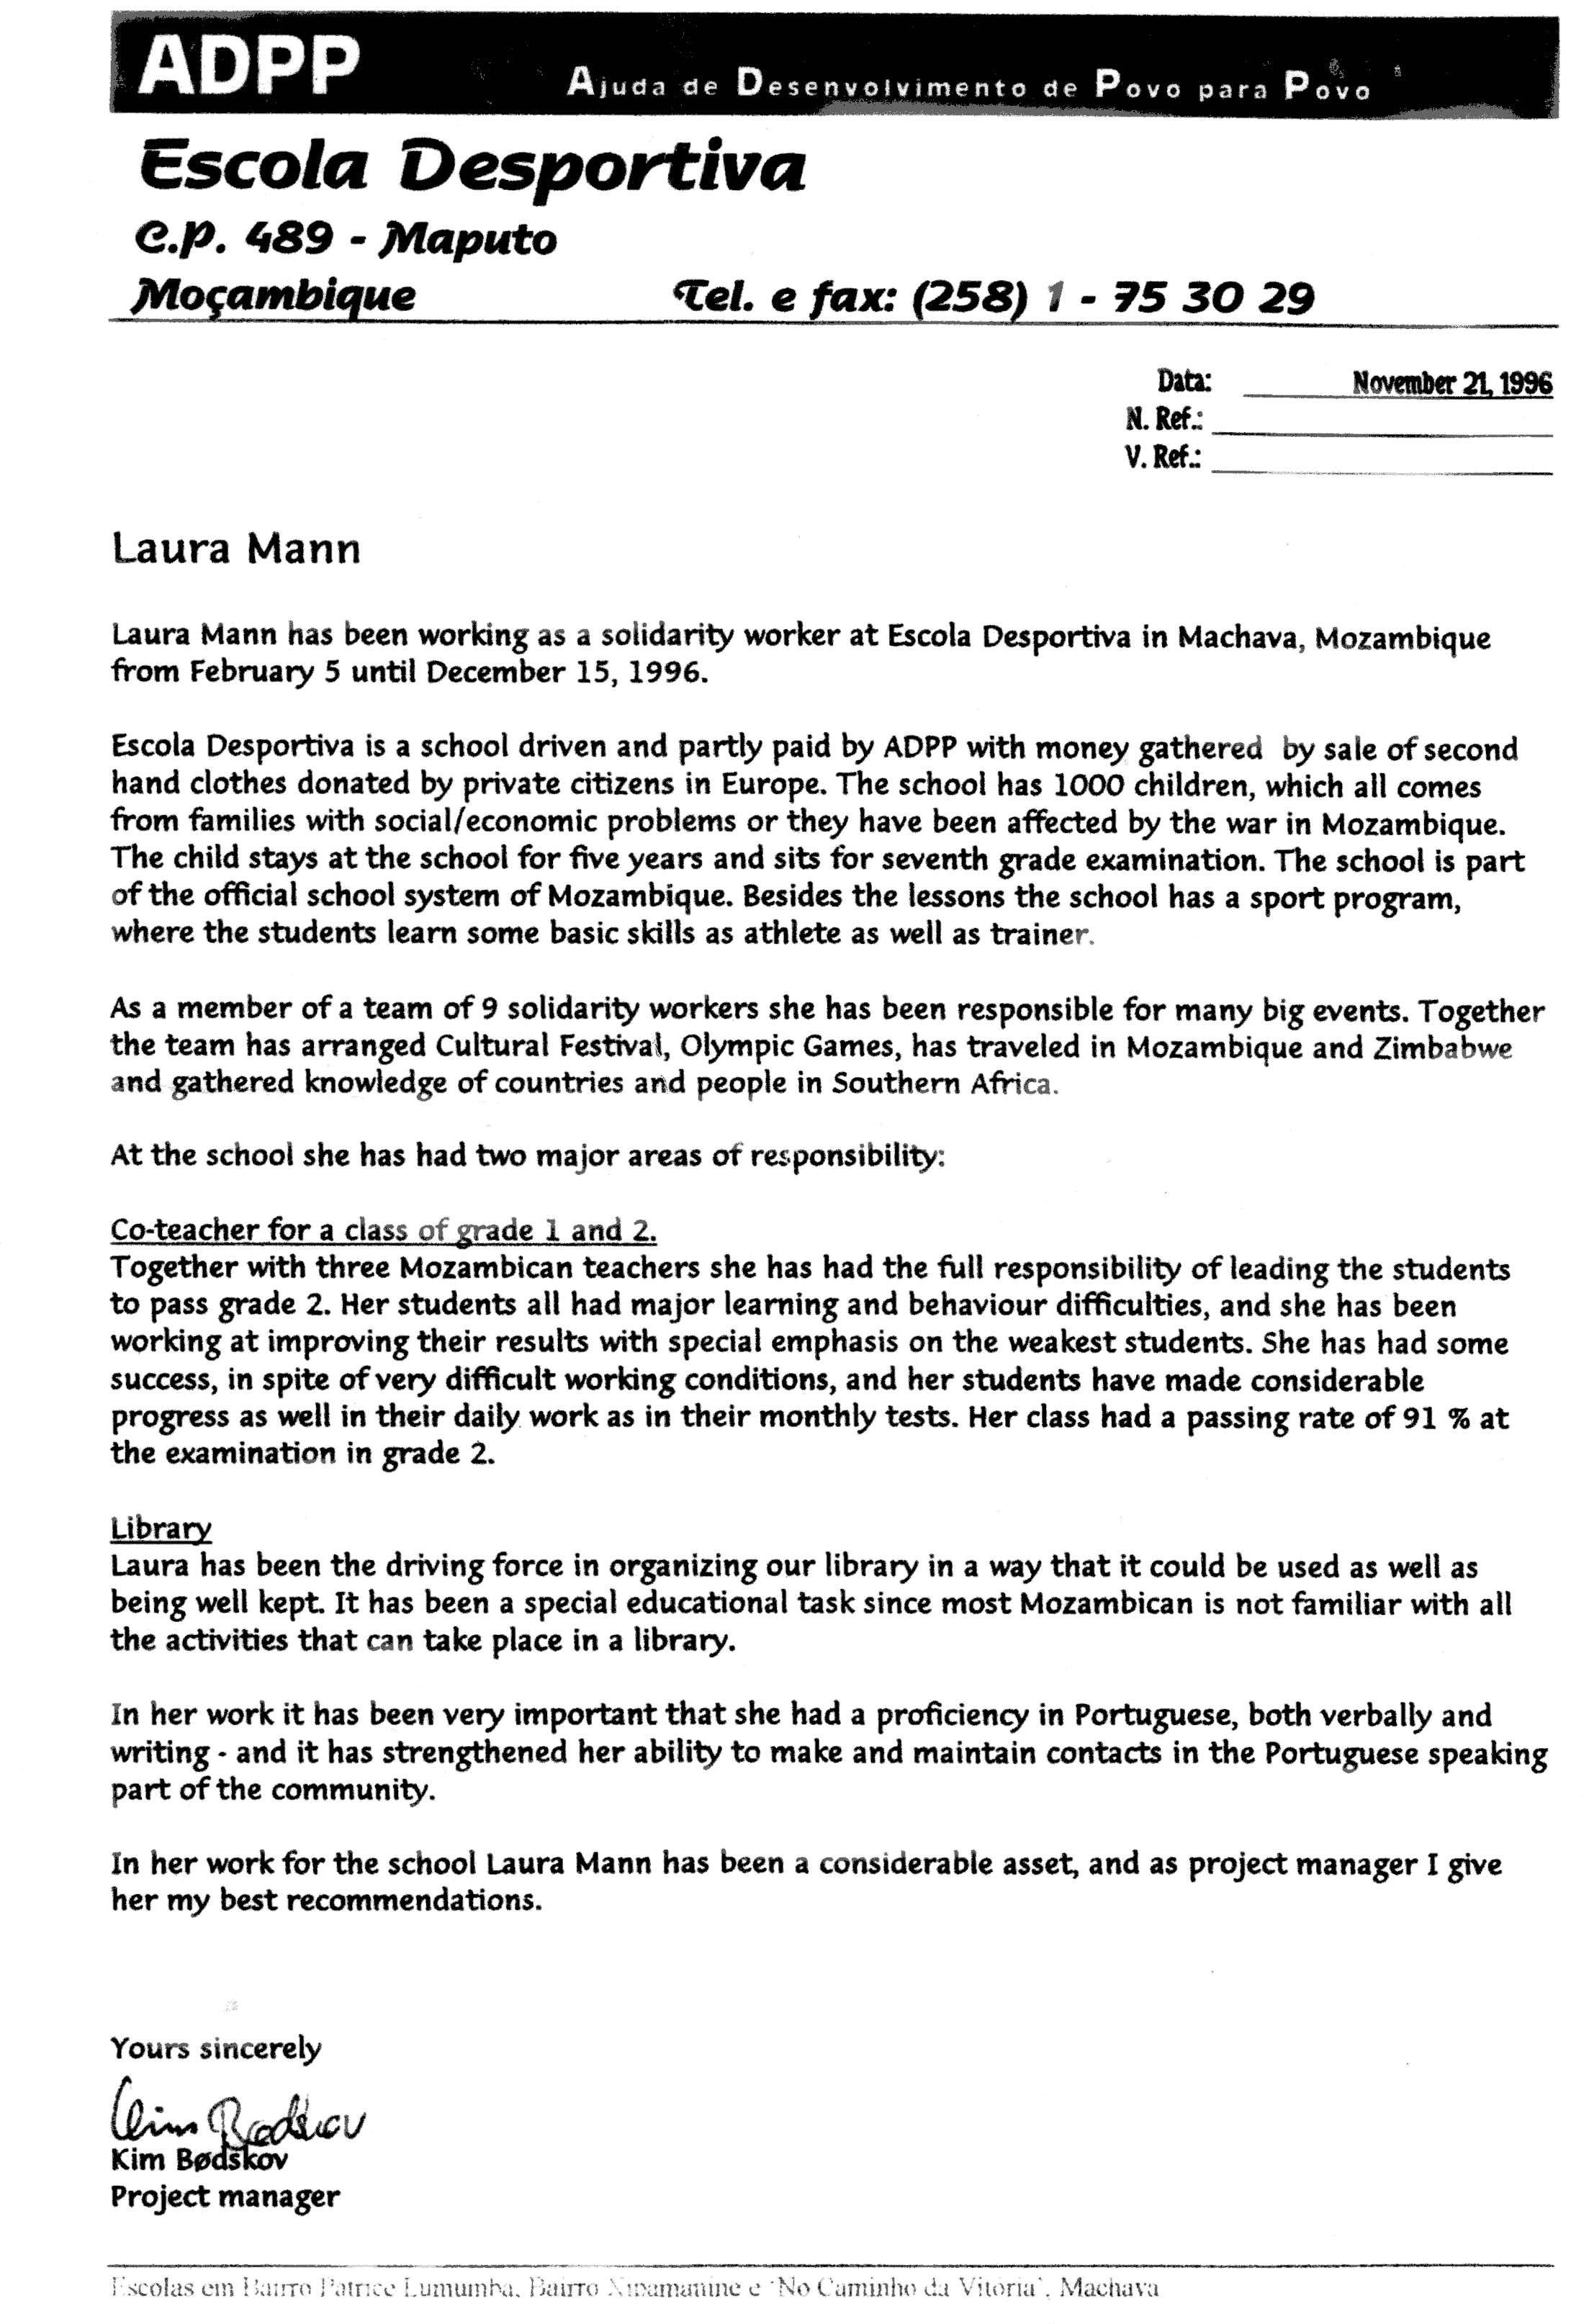 Kindergarten Welcome Letter Template - Letter for Volunteer Teachervolunteer Letter Template Application